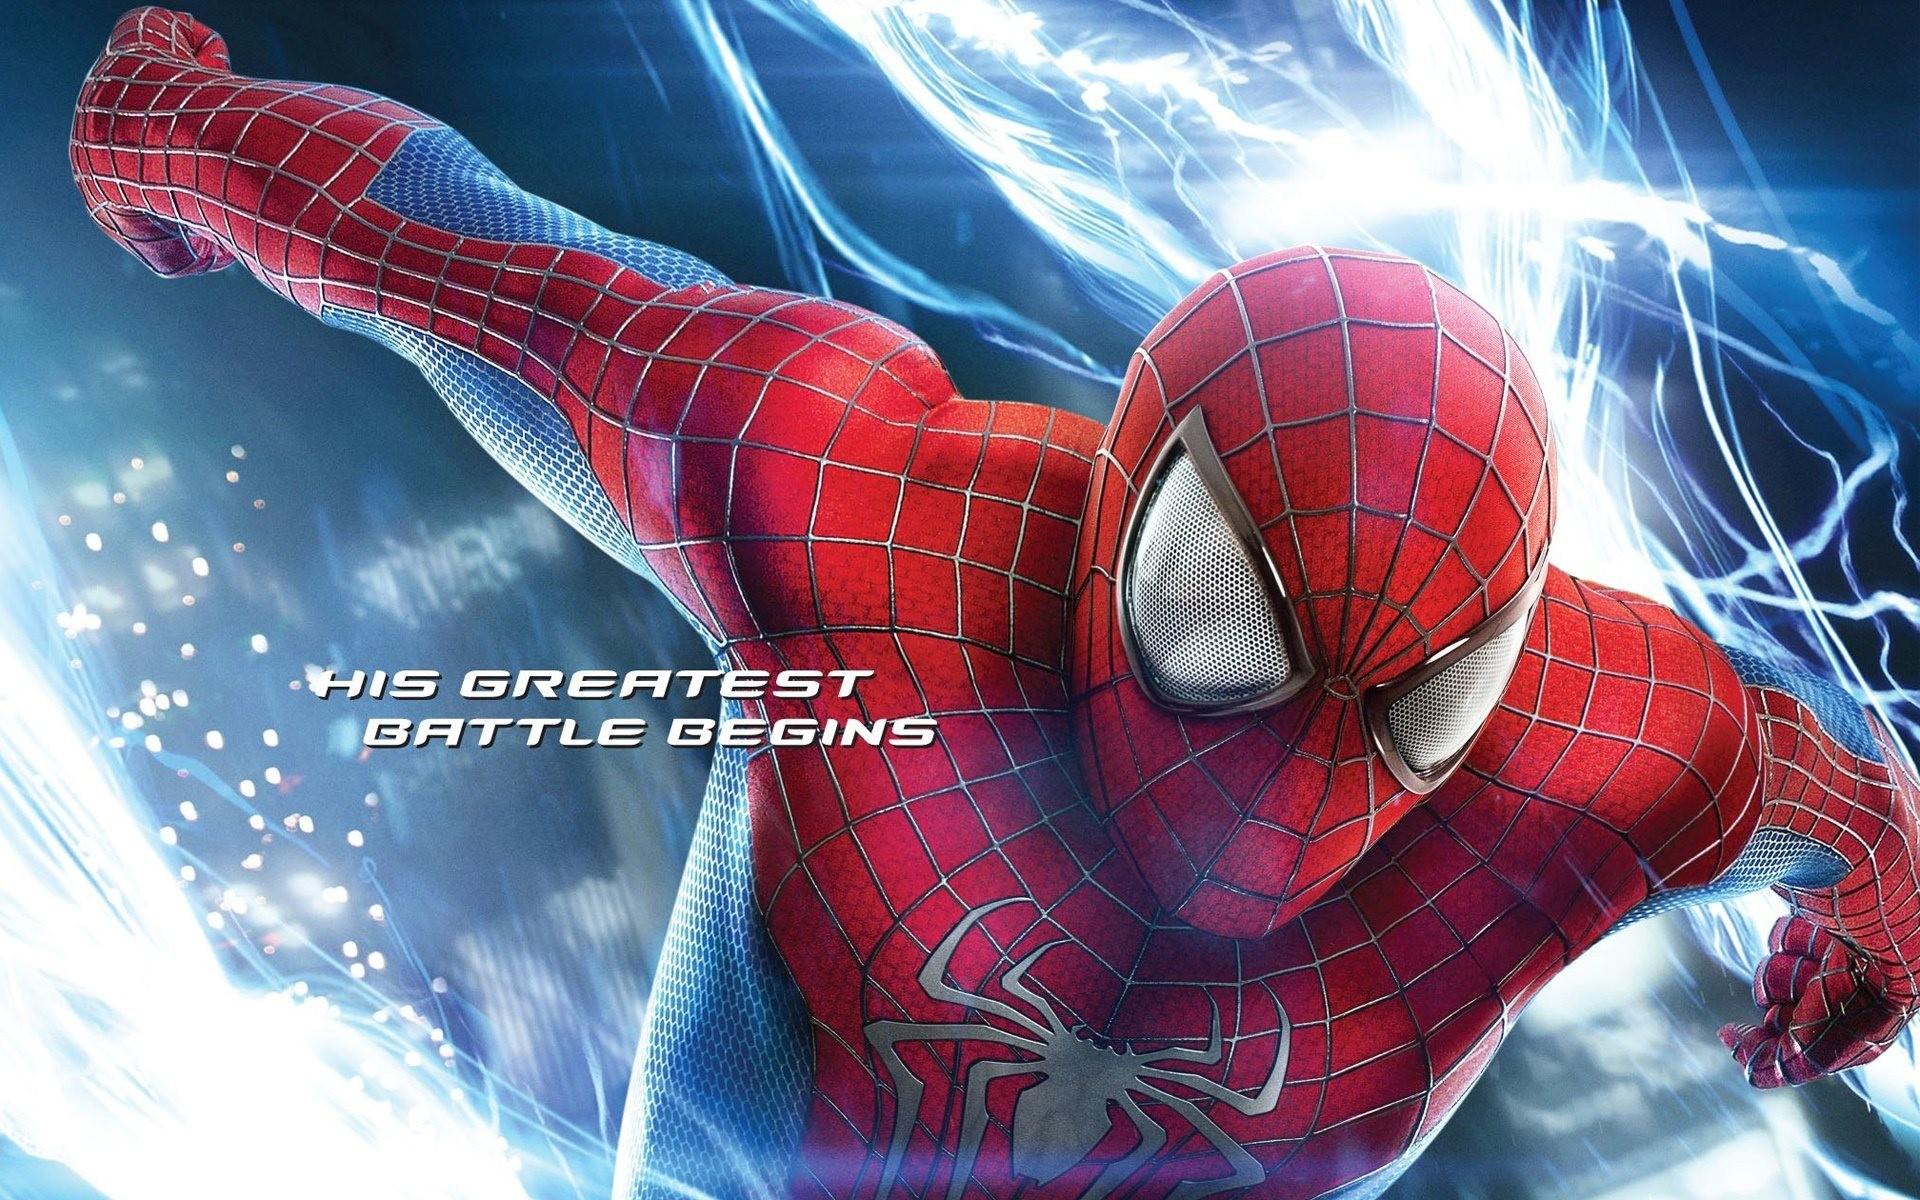 Spiderman Latest Wallpapers HD Wallpapers 1920×1080 Spiderman Wallpaper Hd  (47 Wallpapers) | Adorable Wallpapers | Desktop | Pinterest | Spiderman, Hd  …